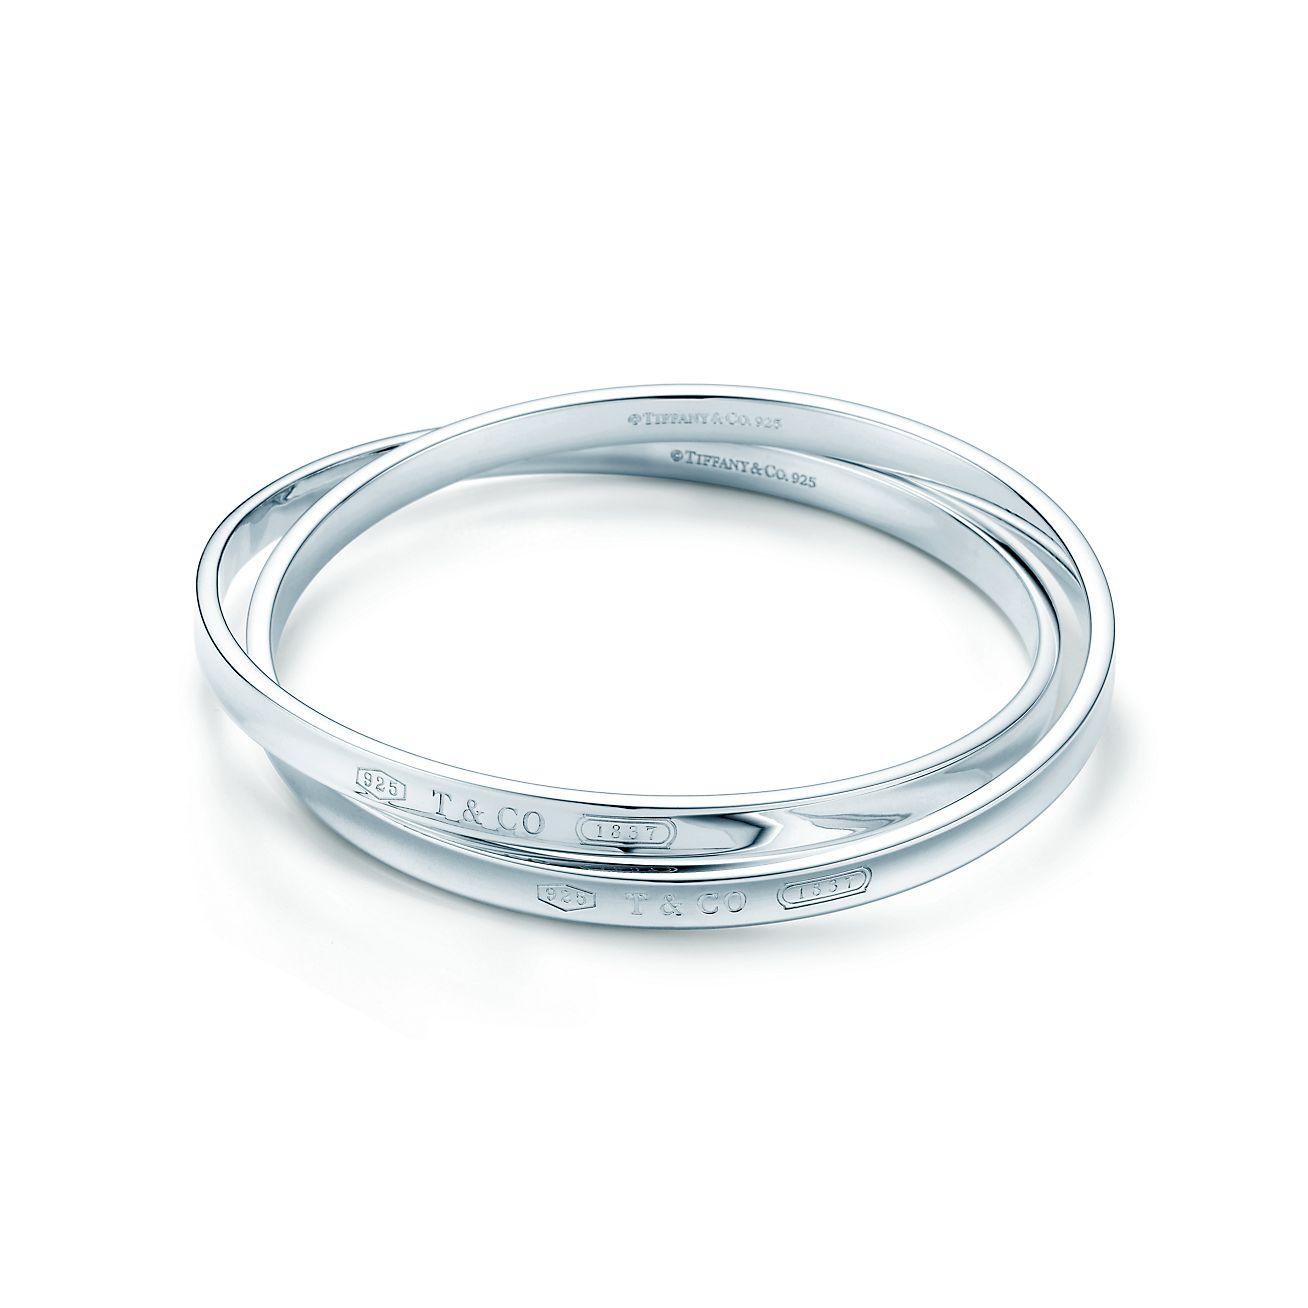 Tiffany 1837™:Interlocking Circles Bangle